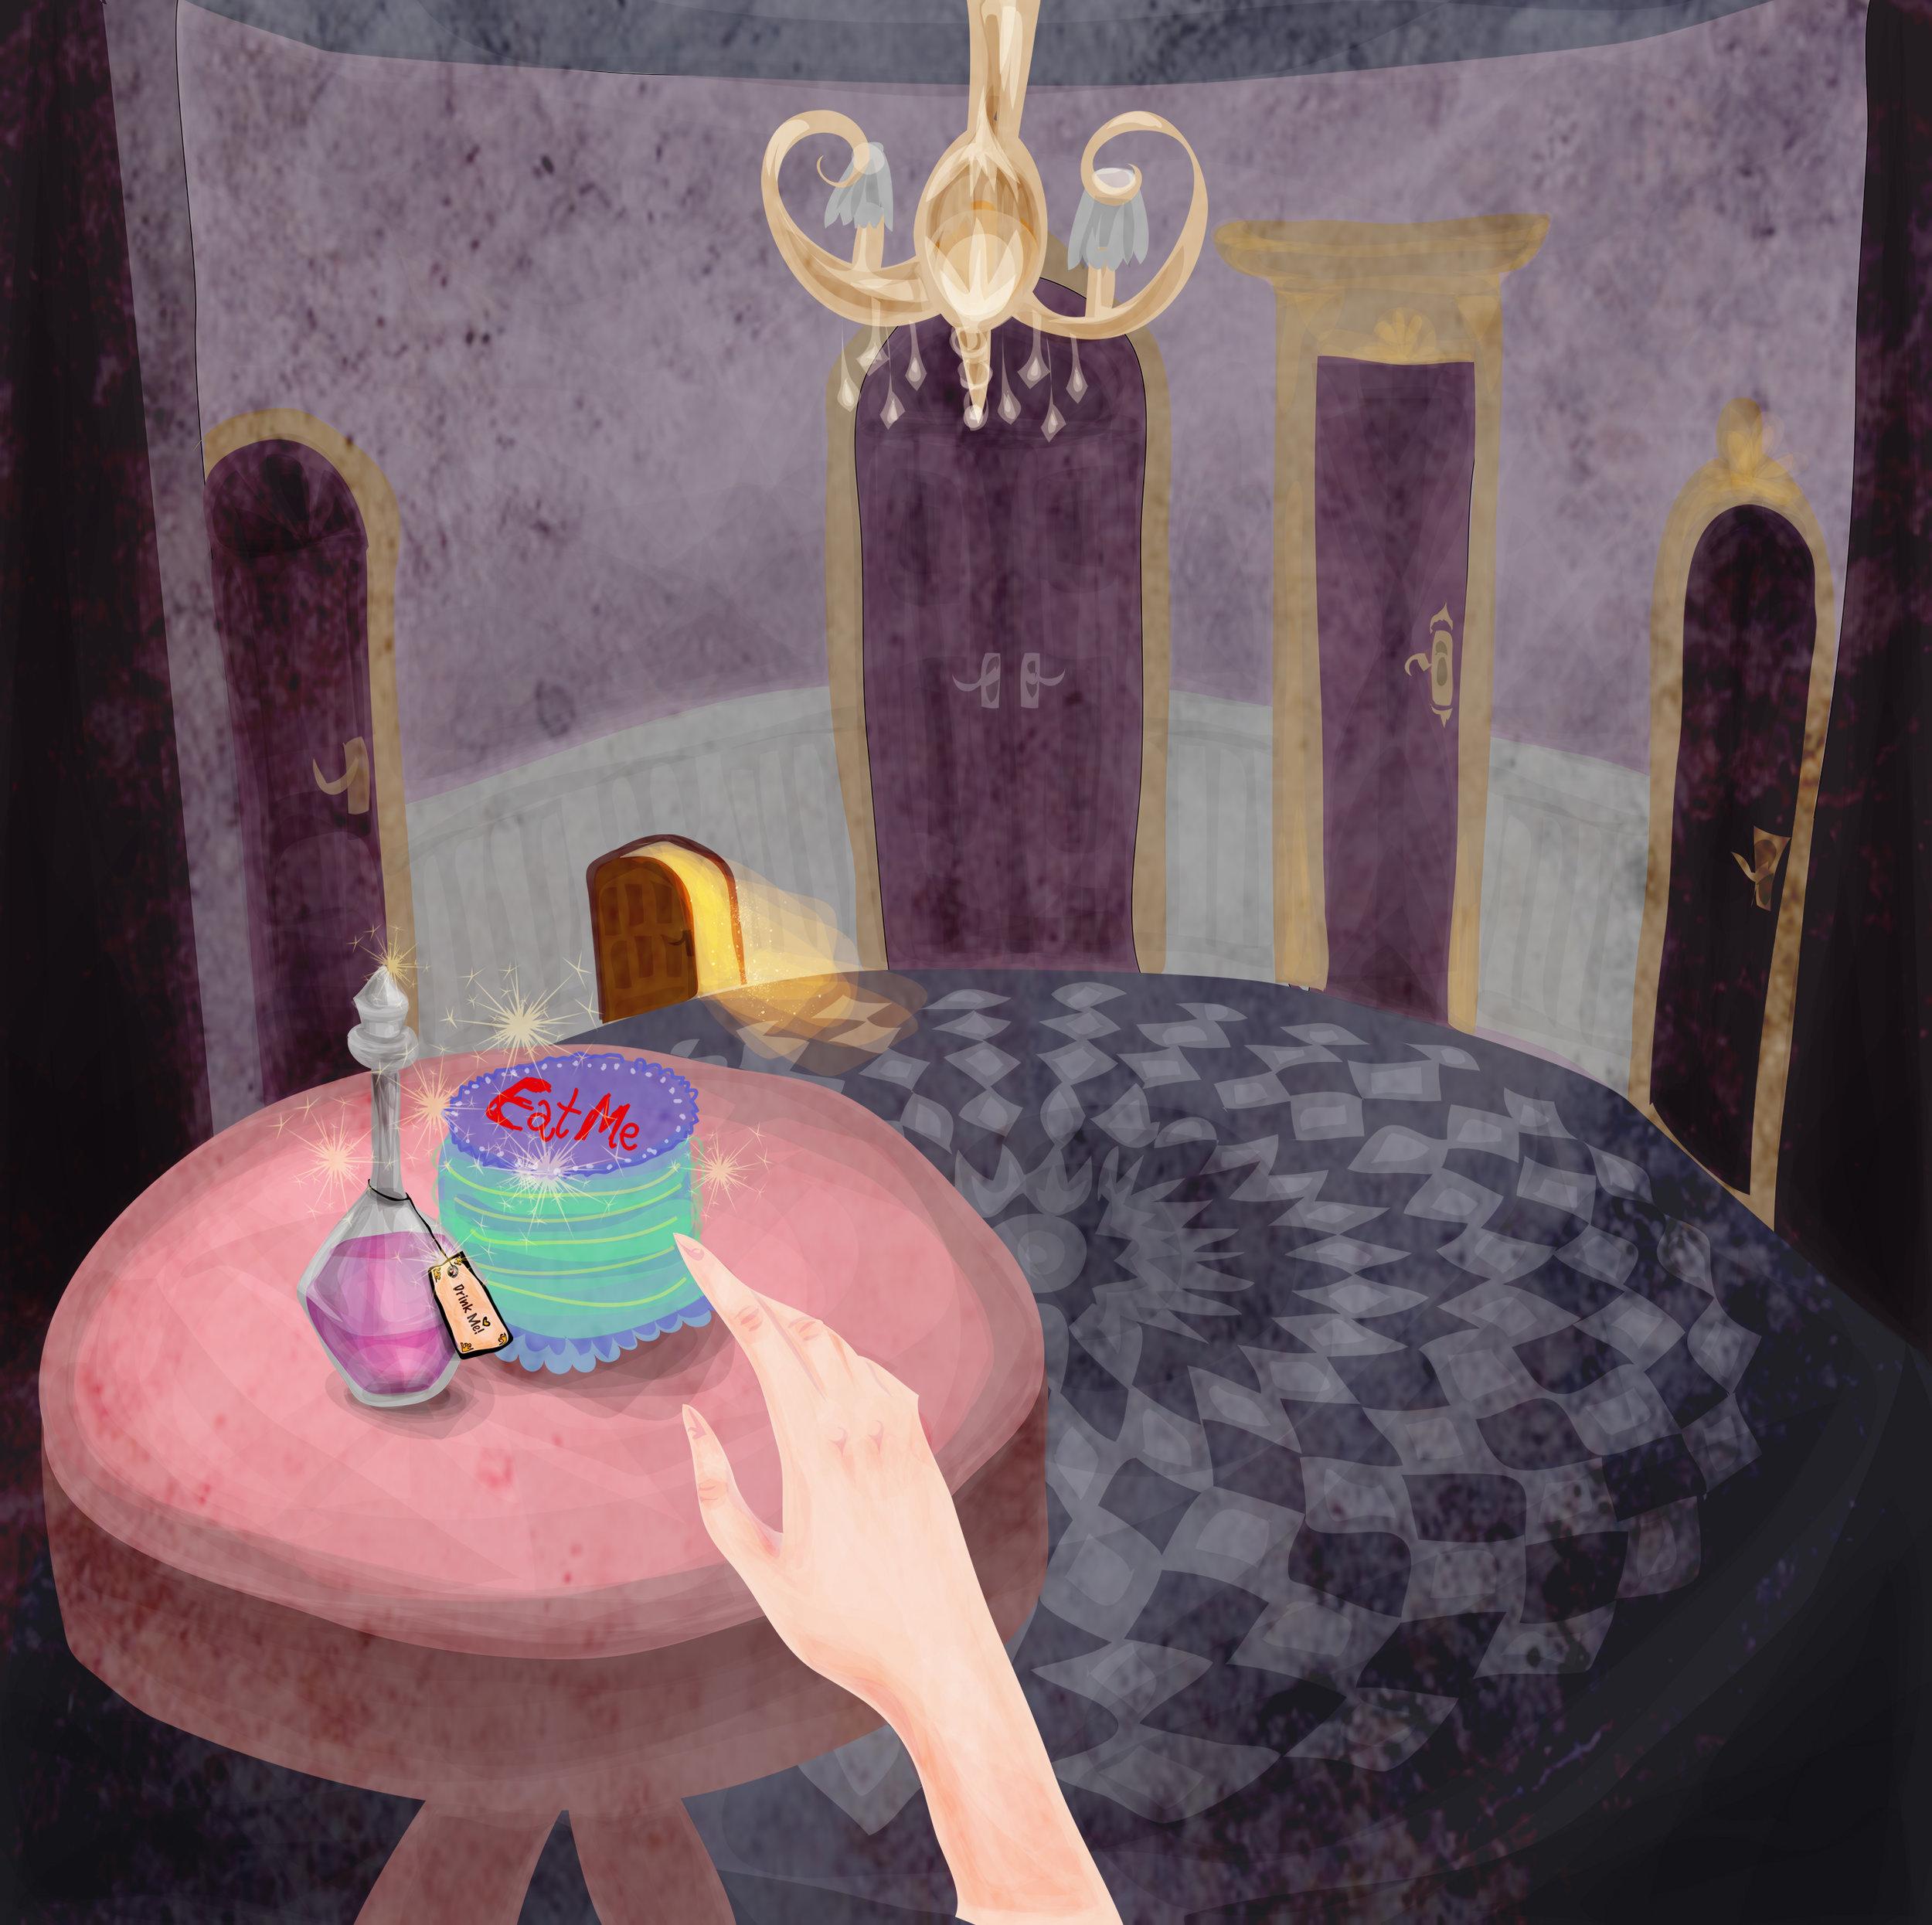 Alice-Room-drink me-Recovered.jpg